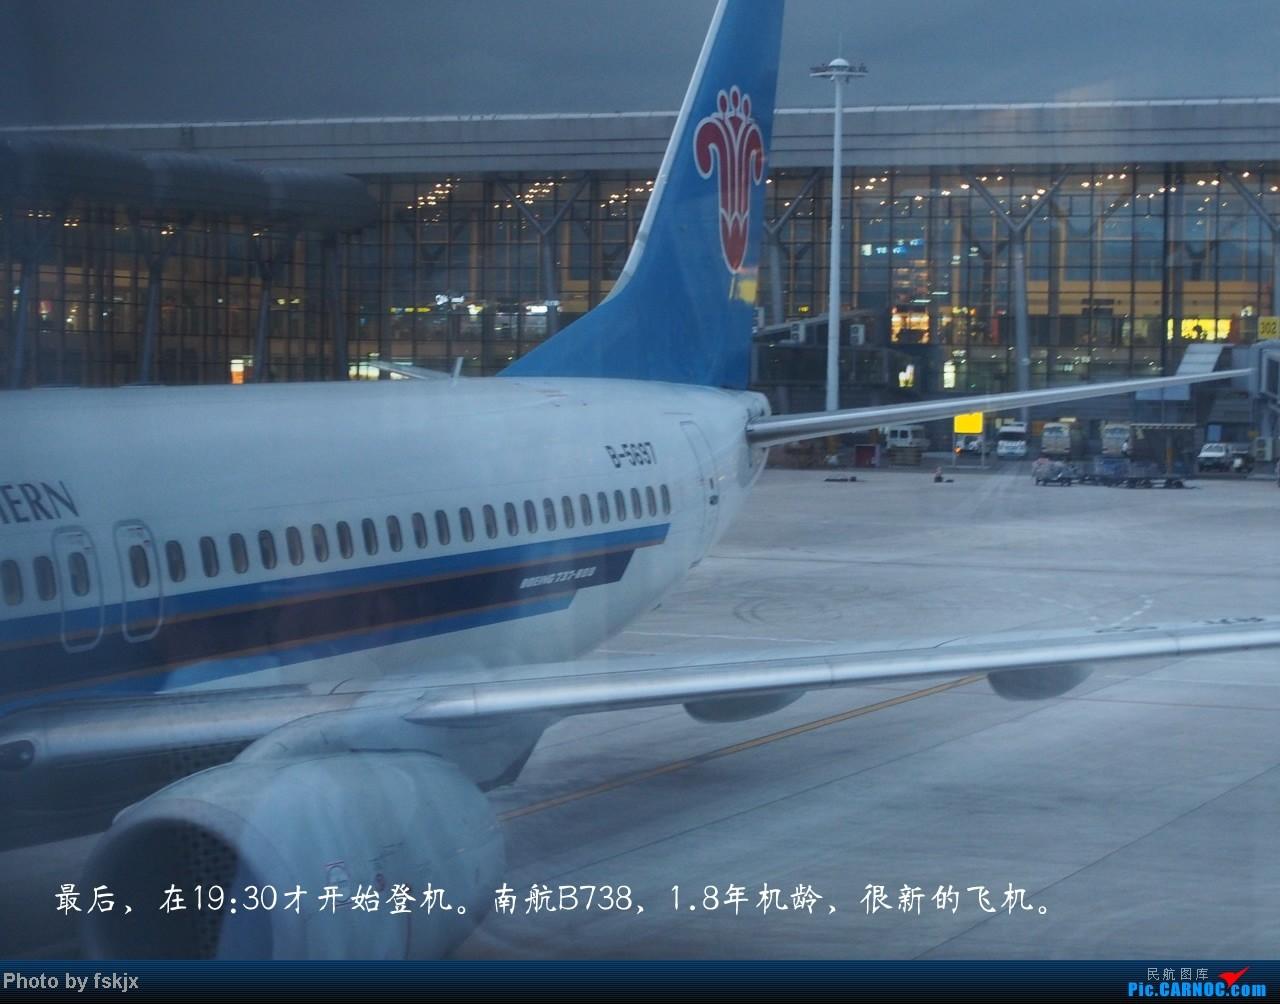 【fskjx的飞行游记☆9】盛夏贵州避暑,感受壮观的黄果树瀑布 BOEING 737-800 B-5697 中国贵阳龙洞堡机场